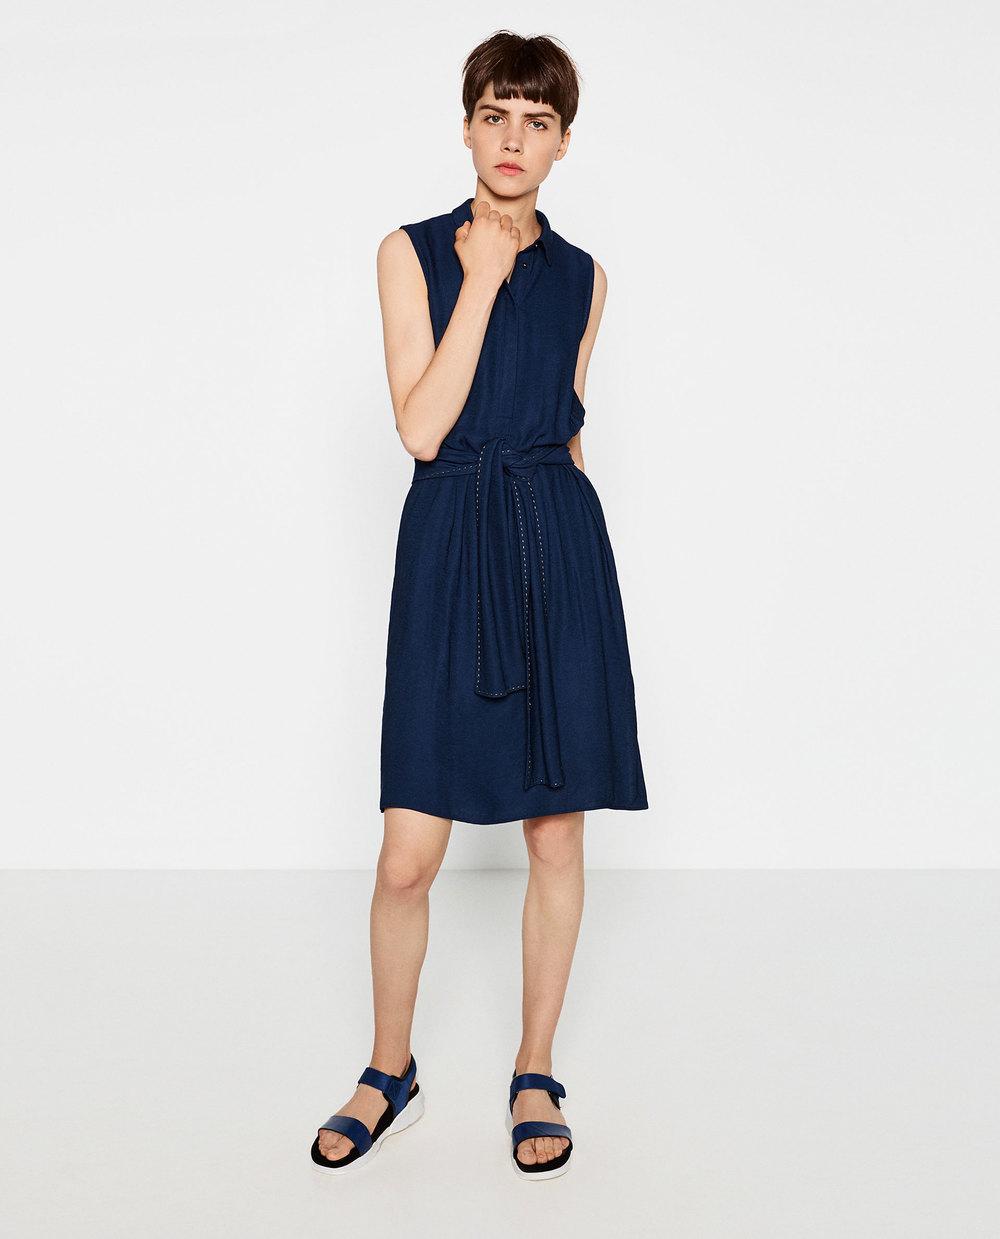 Zara Lace-Up Shirt Dress, $50 at    Zara.com   .